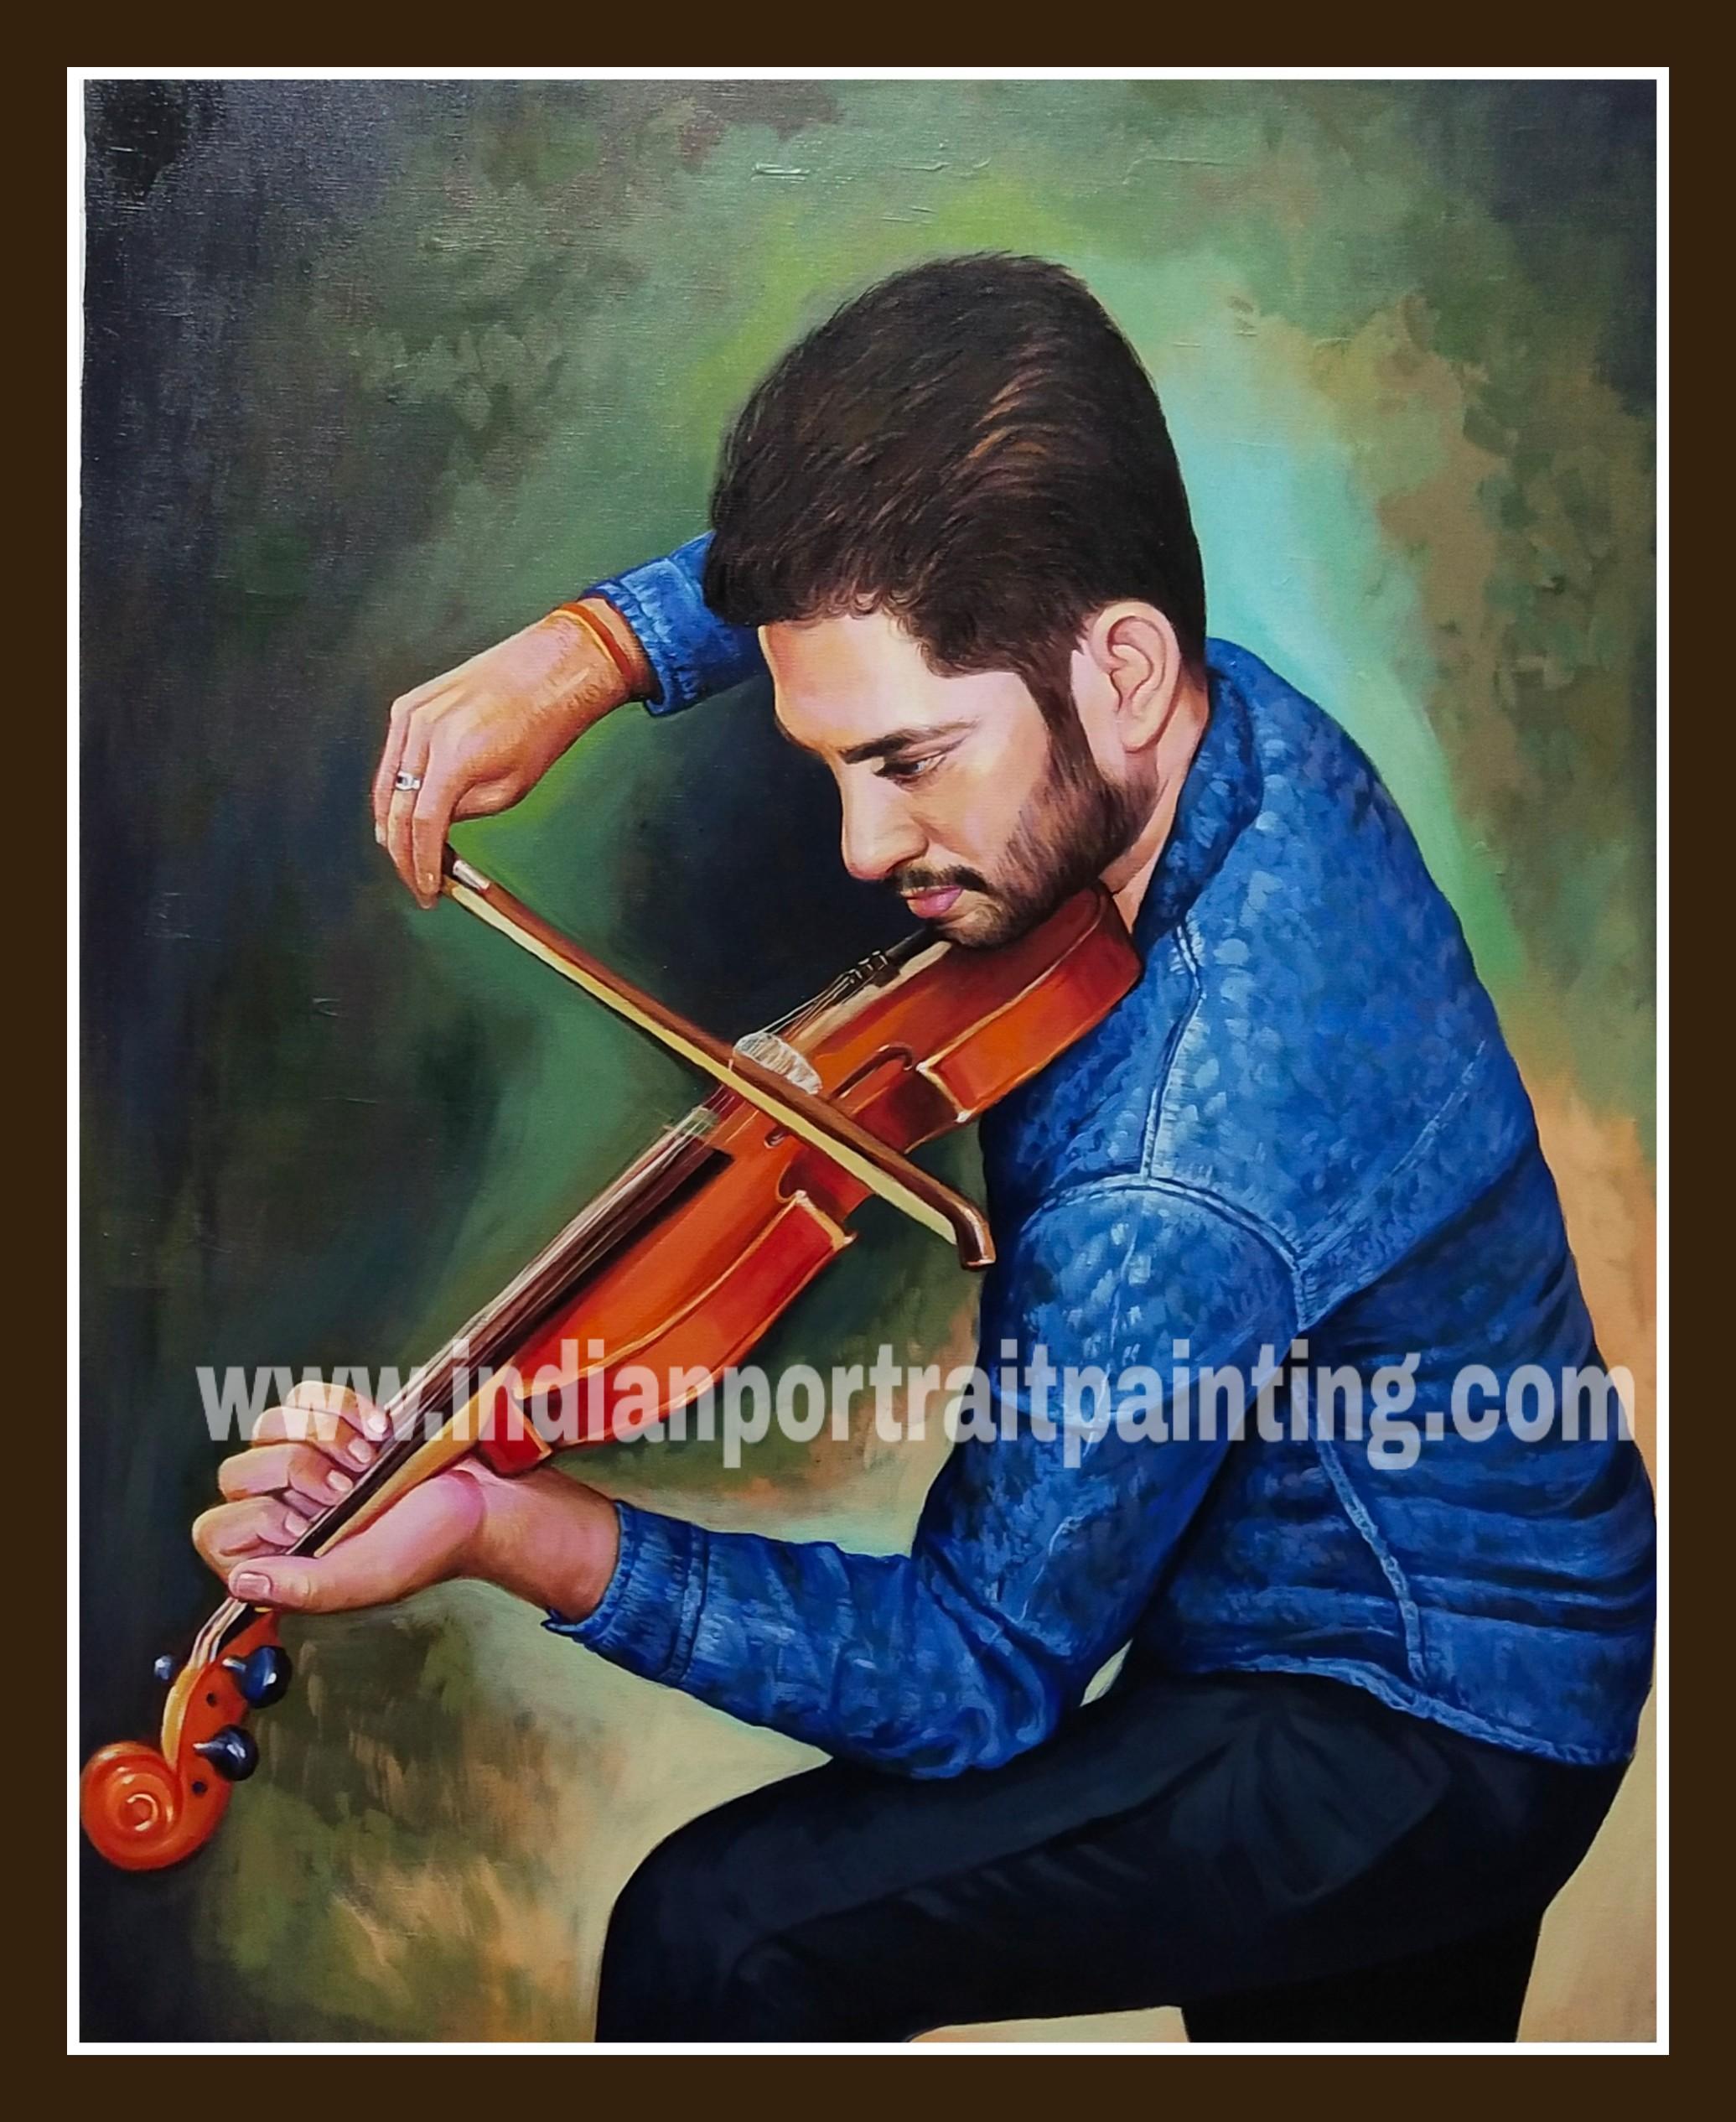 Hand painted portrait artist